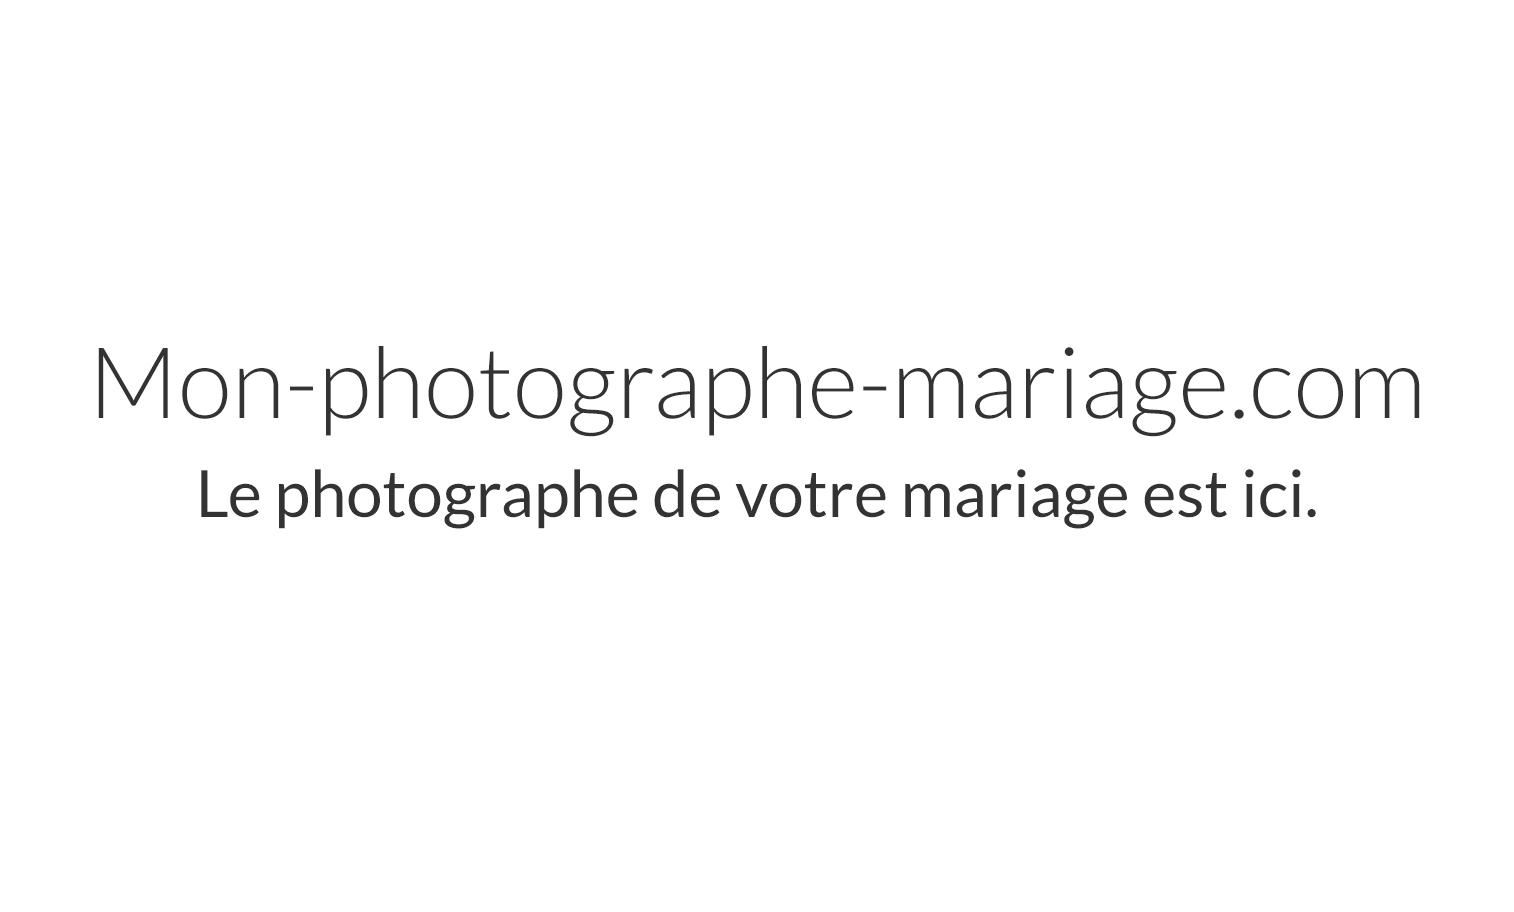 mon photographe mariage annuaire de photographes mariages en france - Jingoo Photo Mariage